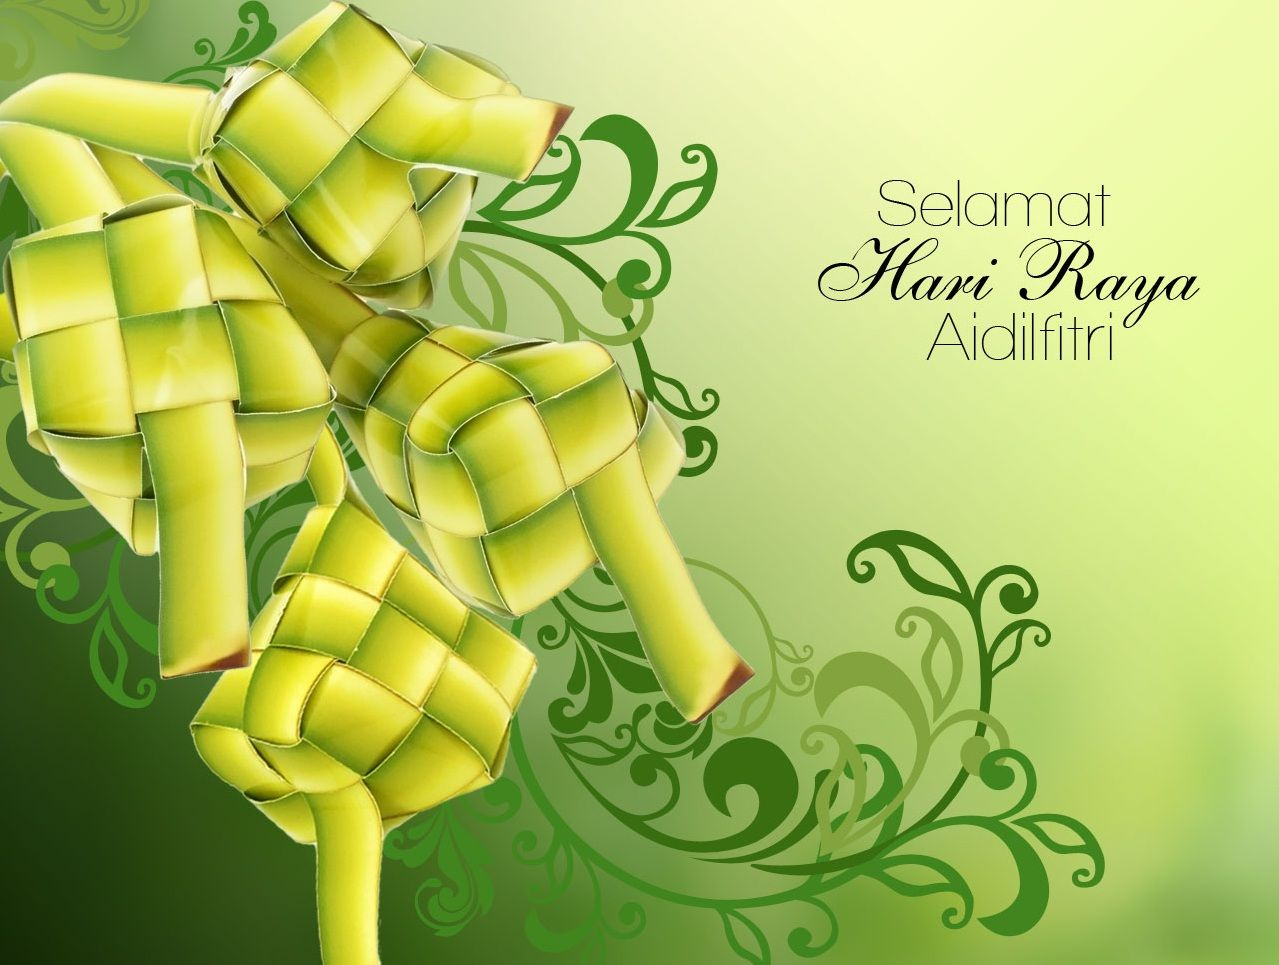 Hari Raya Puasa Selamat Aidilfitri Malaysian 2019 Wishes Quotes Sms Whatsapp Status Dp Images Eid Greetings Selamat Hari Raya Eid Images